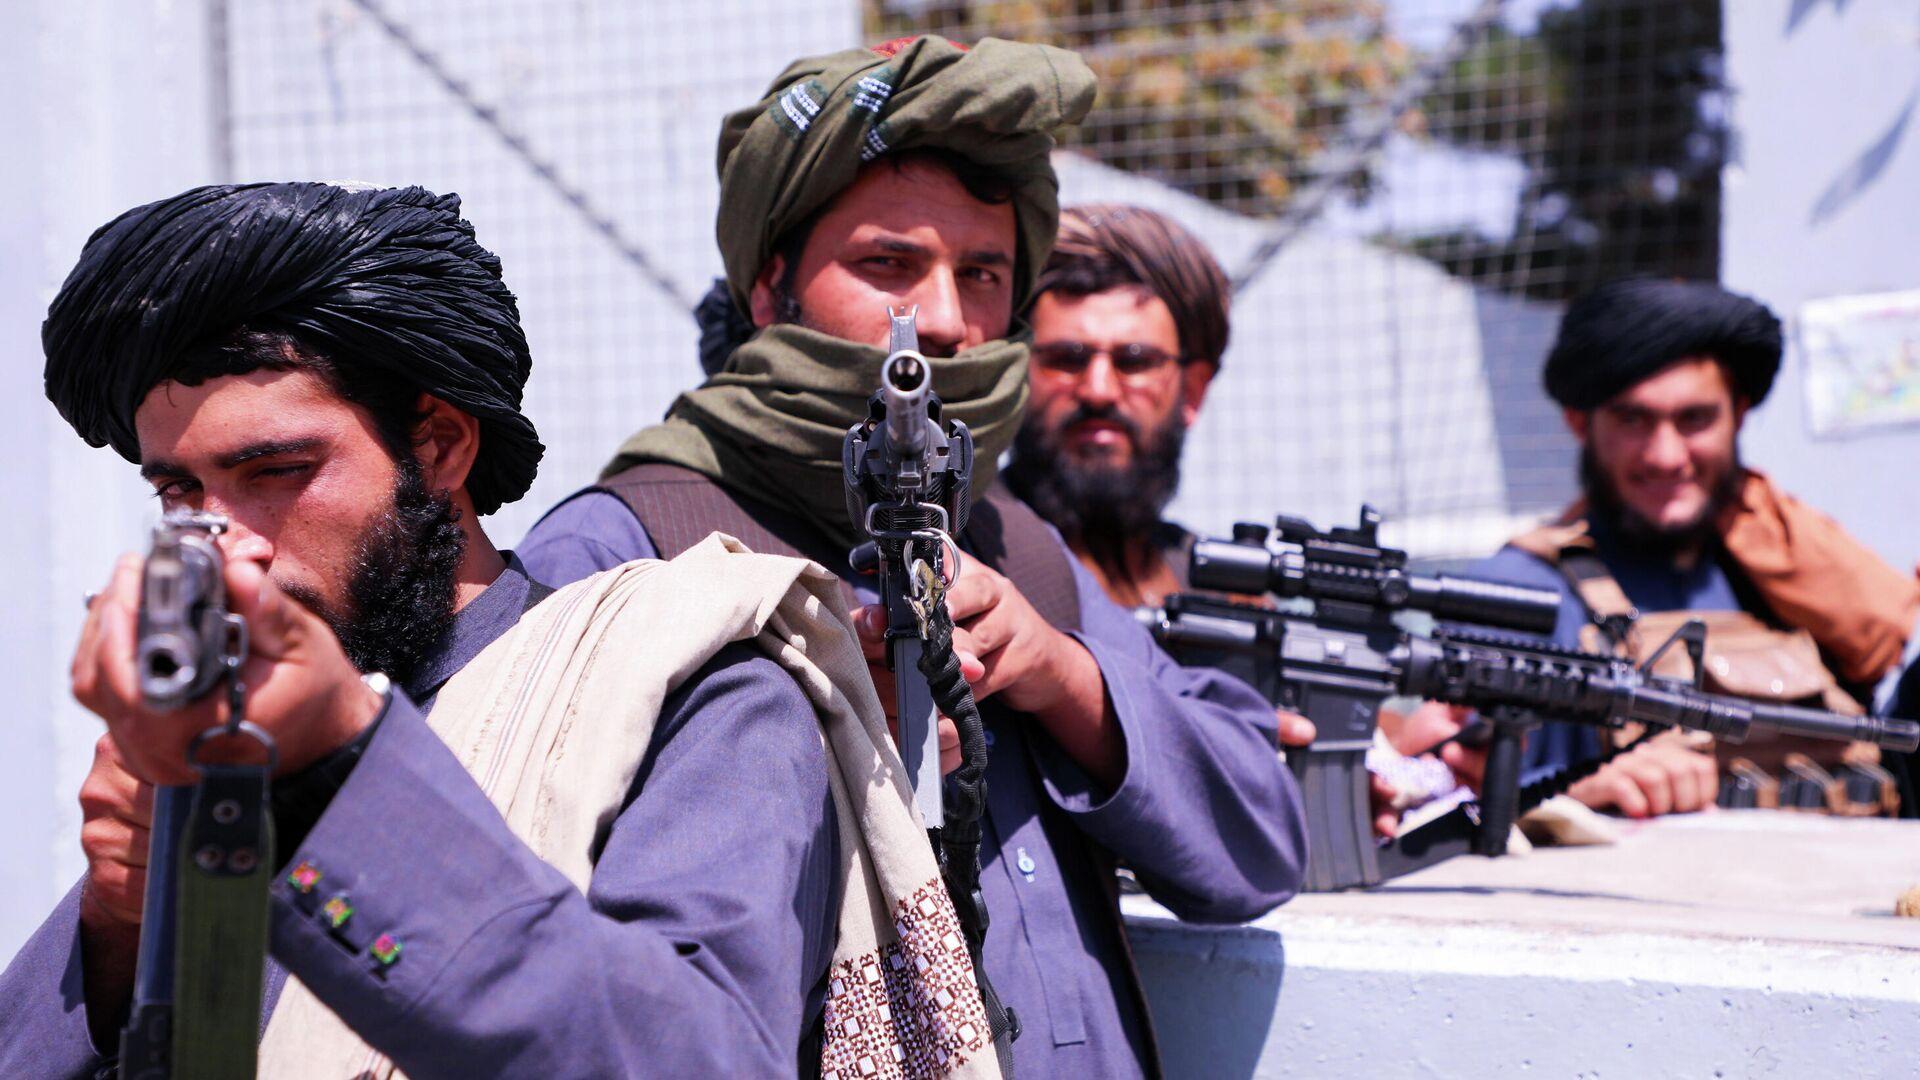 Боевики Талибана* возле аэропорта Кабула - РИА Новости, 1920, 24.09.2021